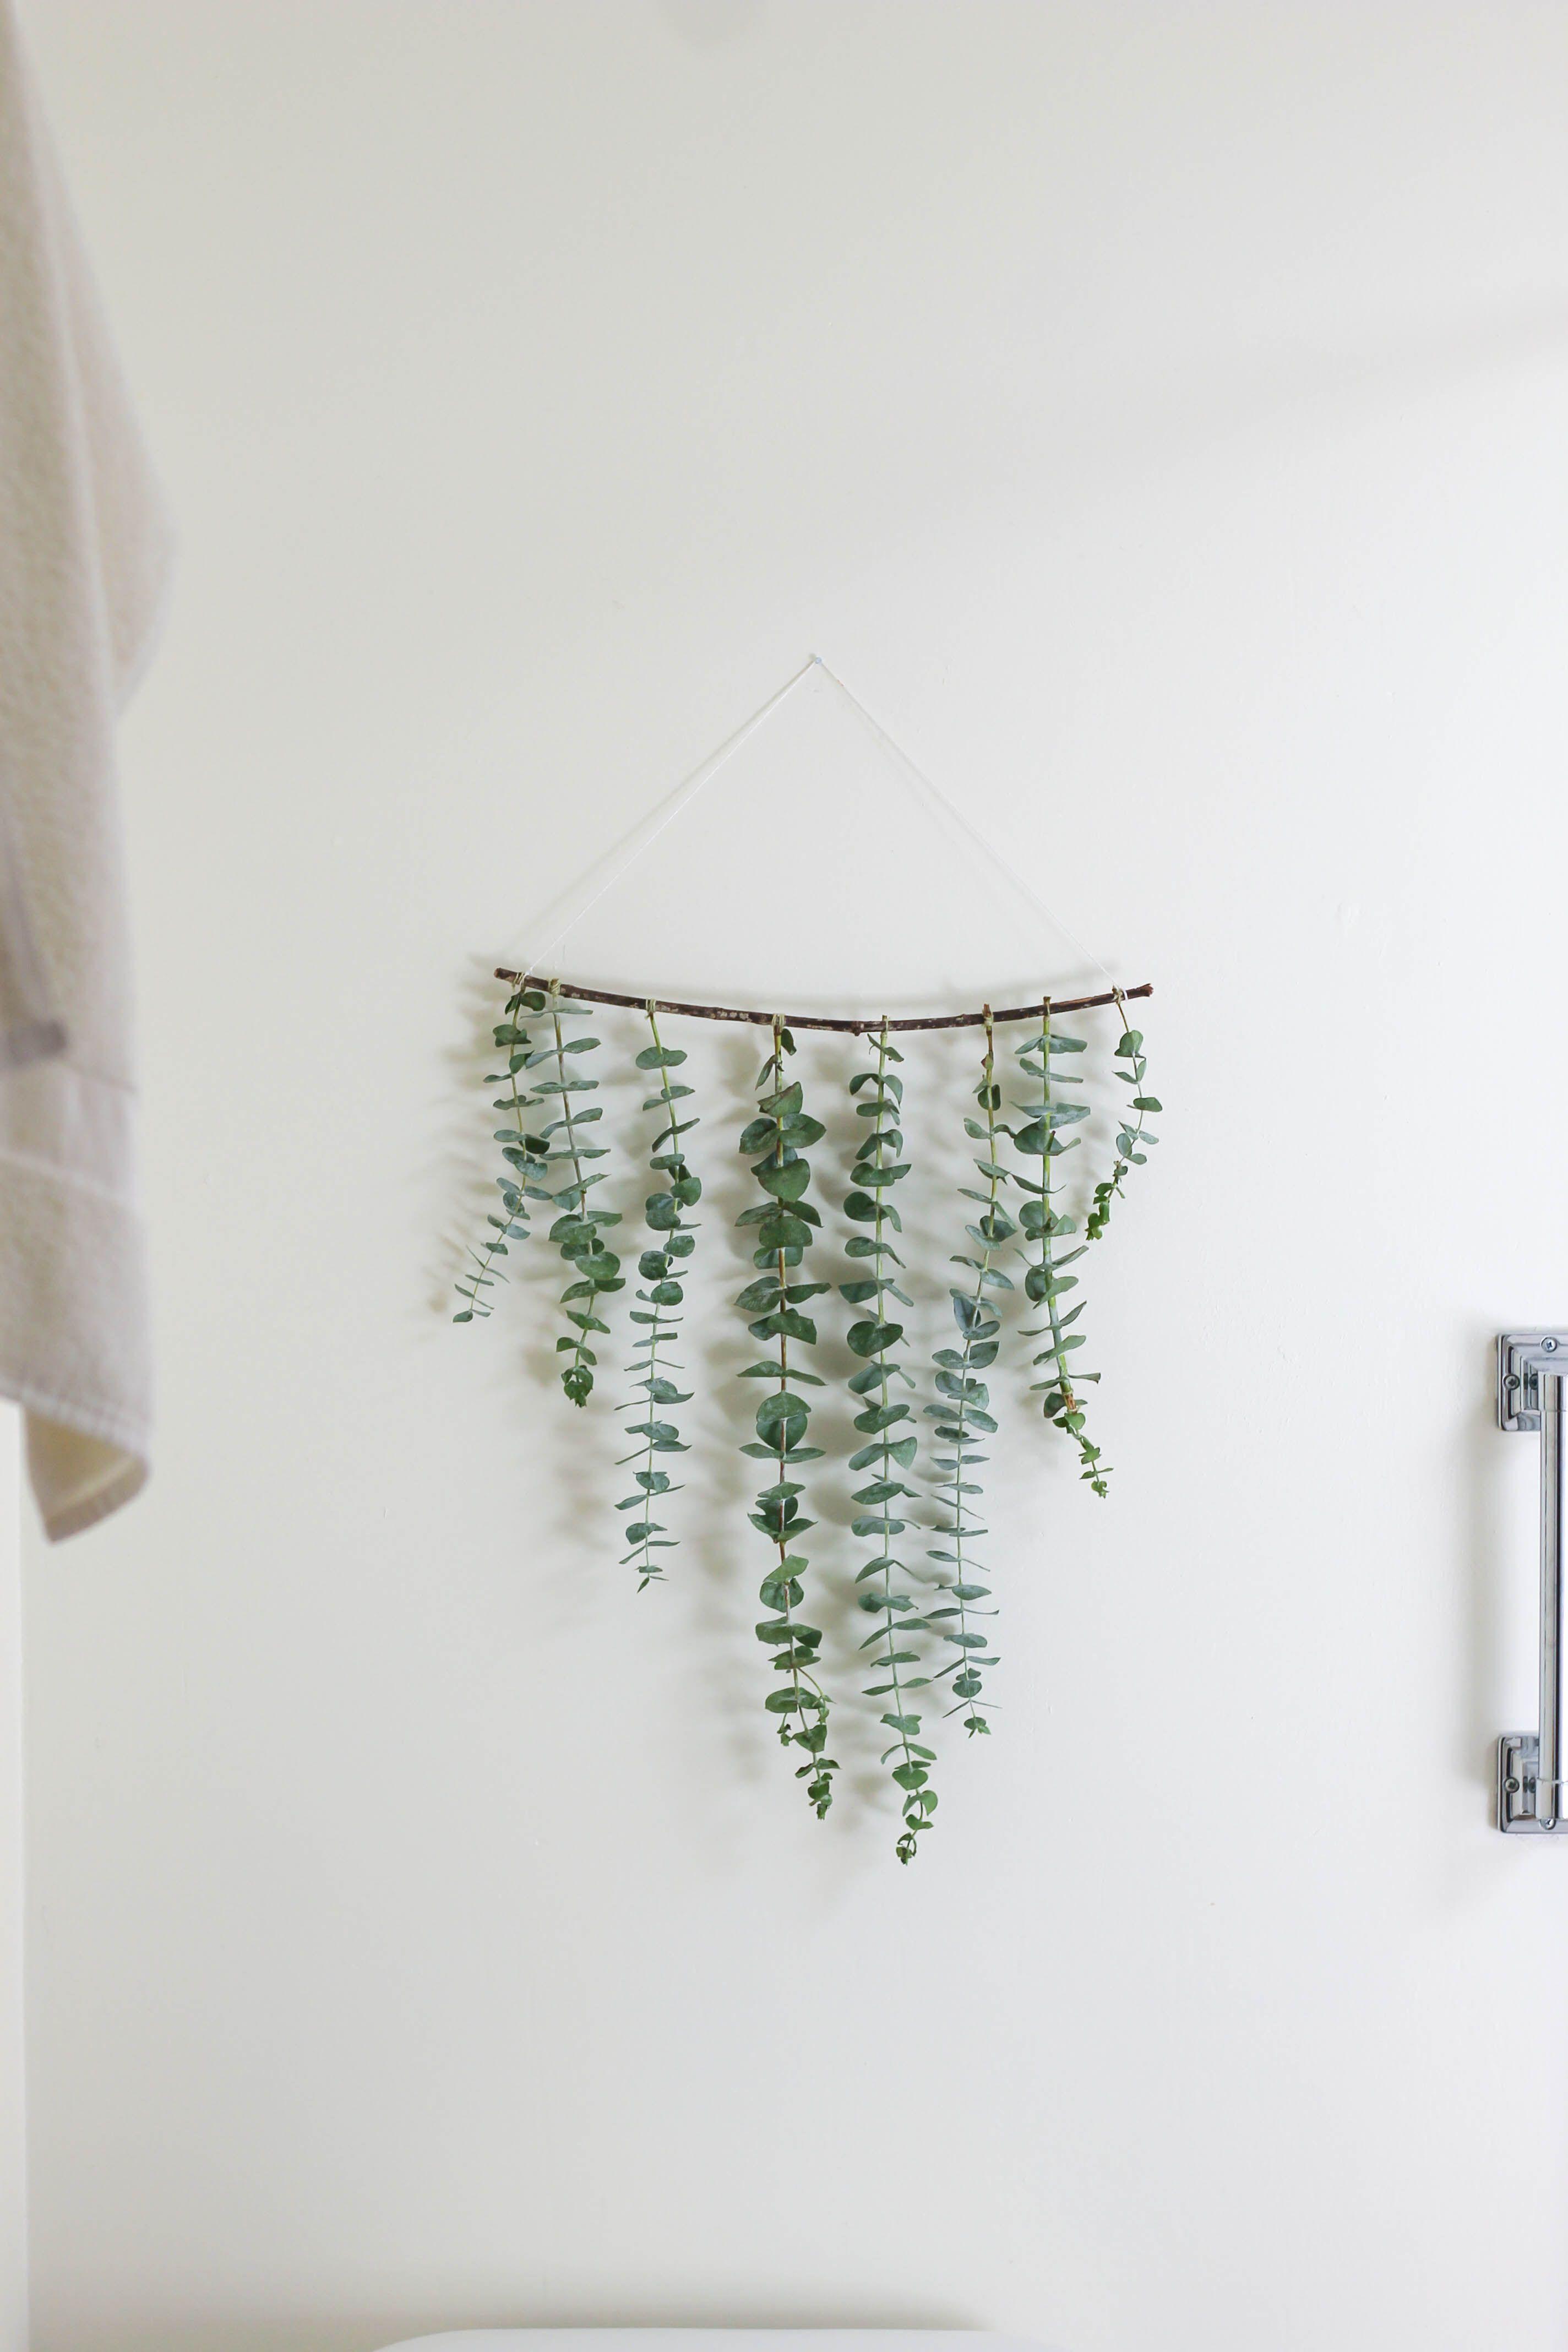 Hanging Eucalyptus D I Y In 2019 Diy Bedroom Decor Diy Home Decor Decor